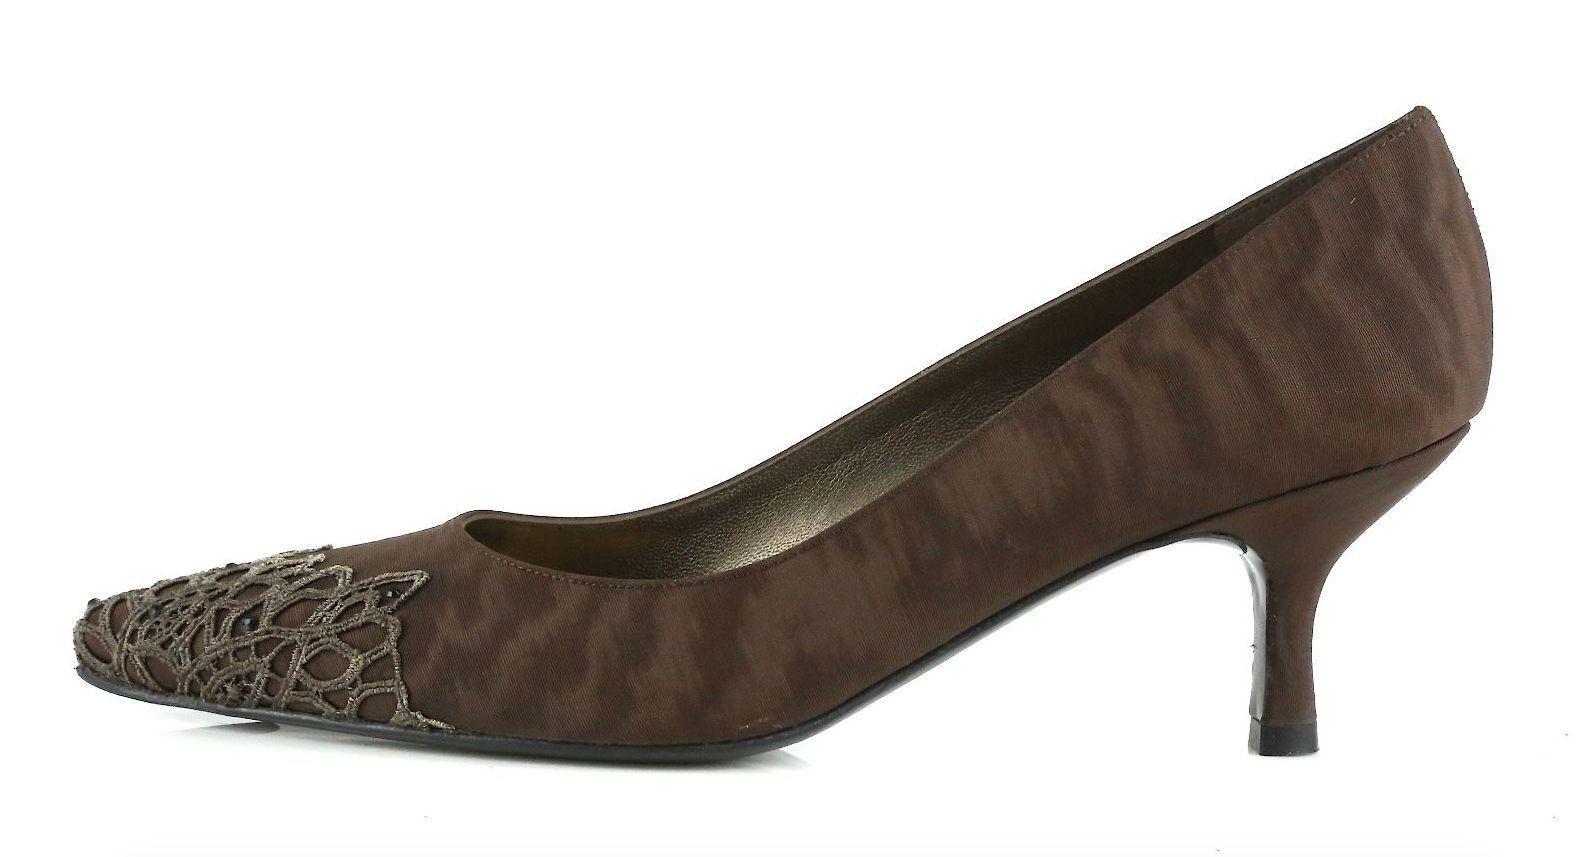 Stuart Weitzman Midnitelace Chocolate Brown Pumps 8989 Size 6 M NEW!